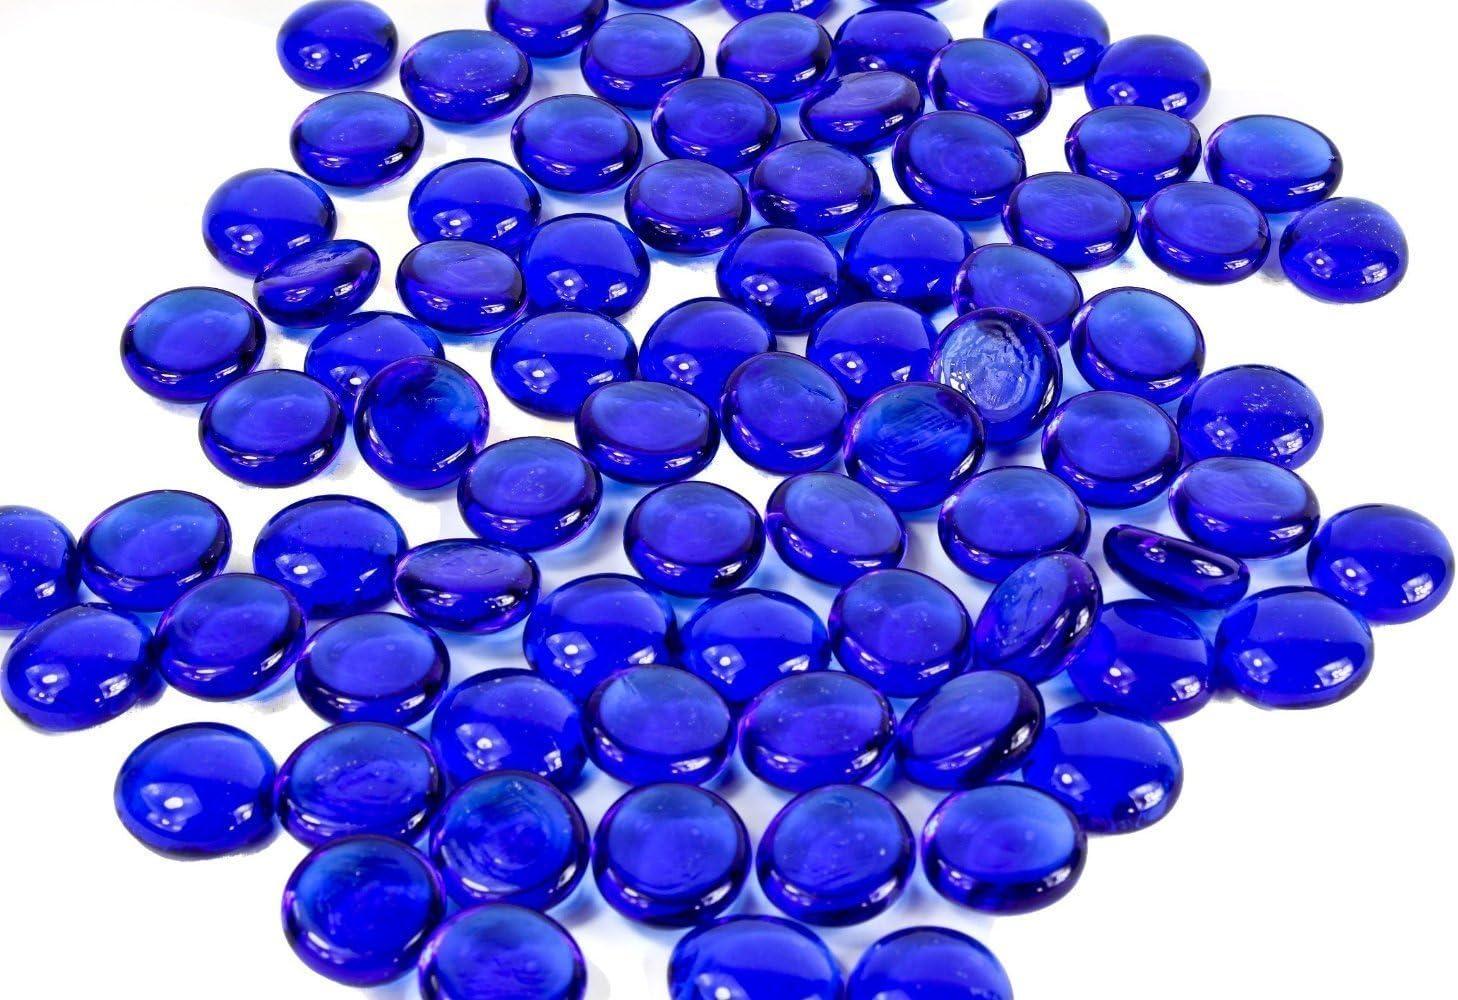 Dashington 5 Pounds-Flat Cobalt Glass Marbles for Vase Filler, Table Scatter, Aquarium Decor